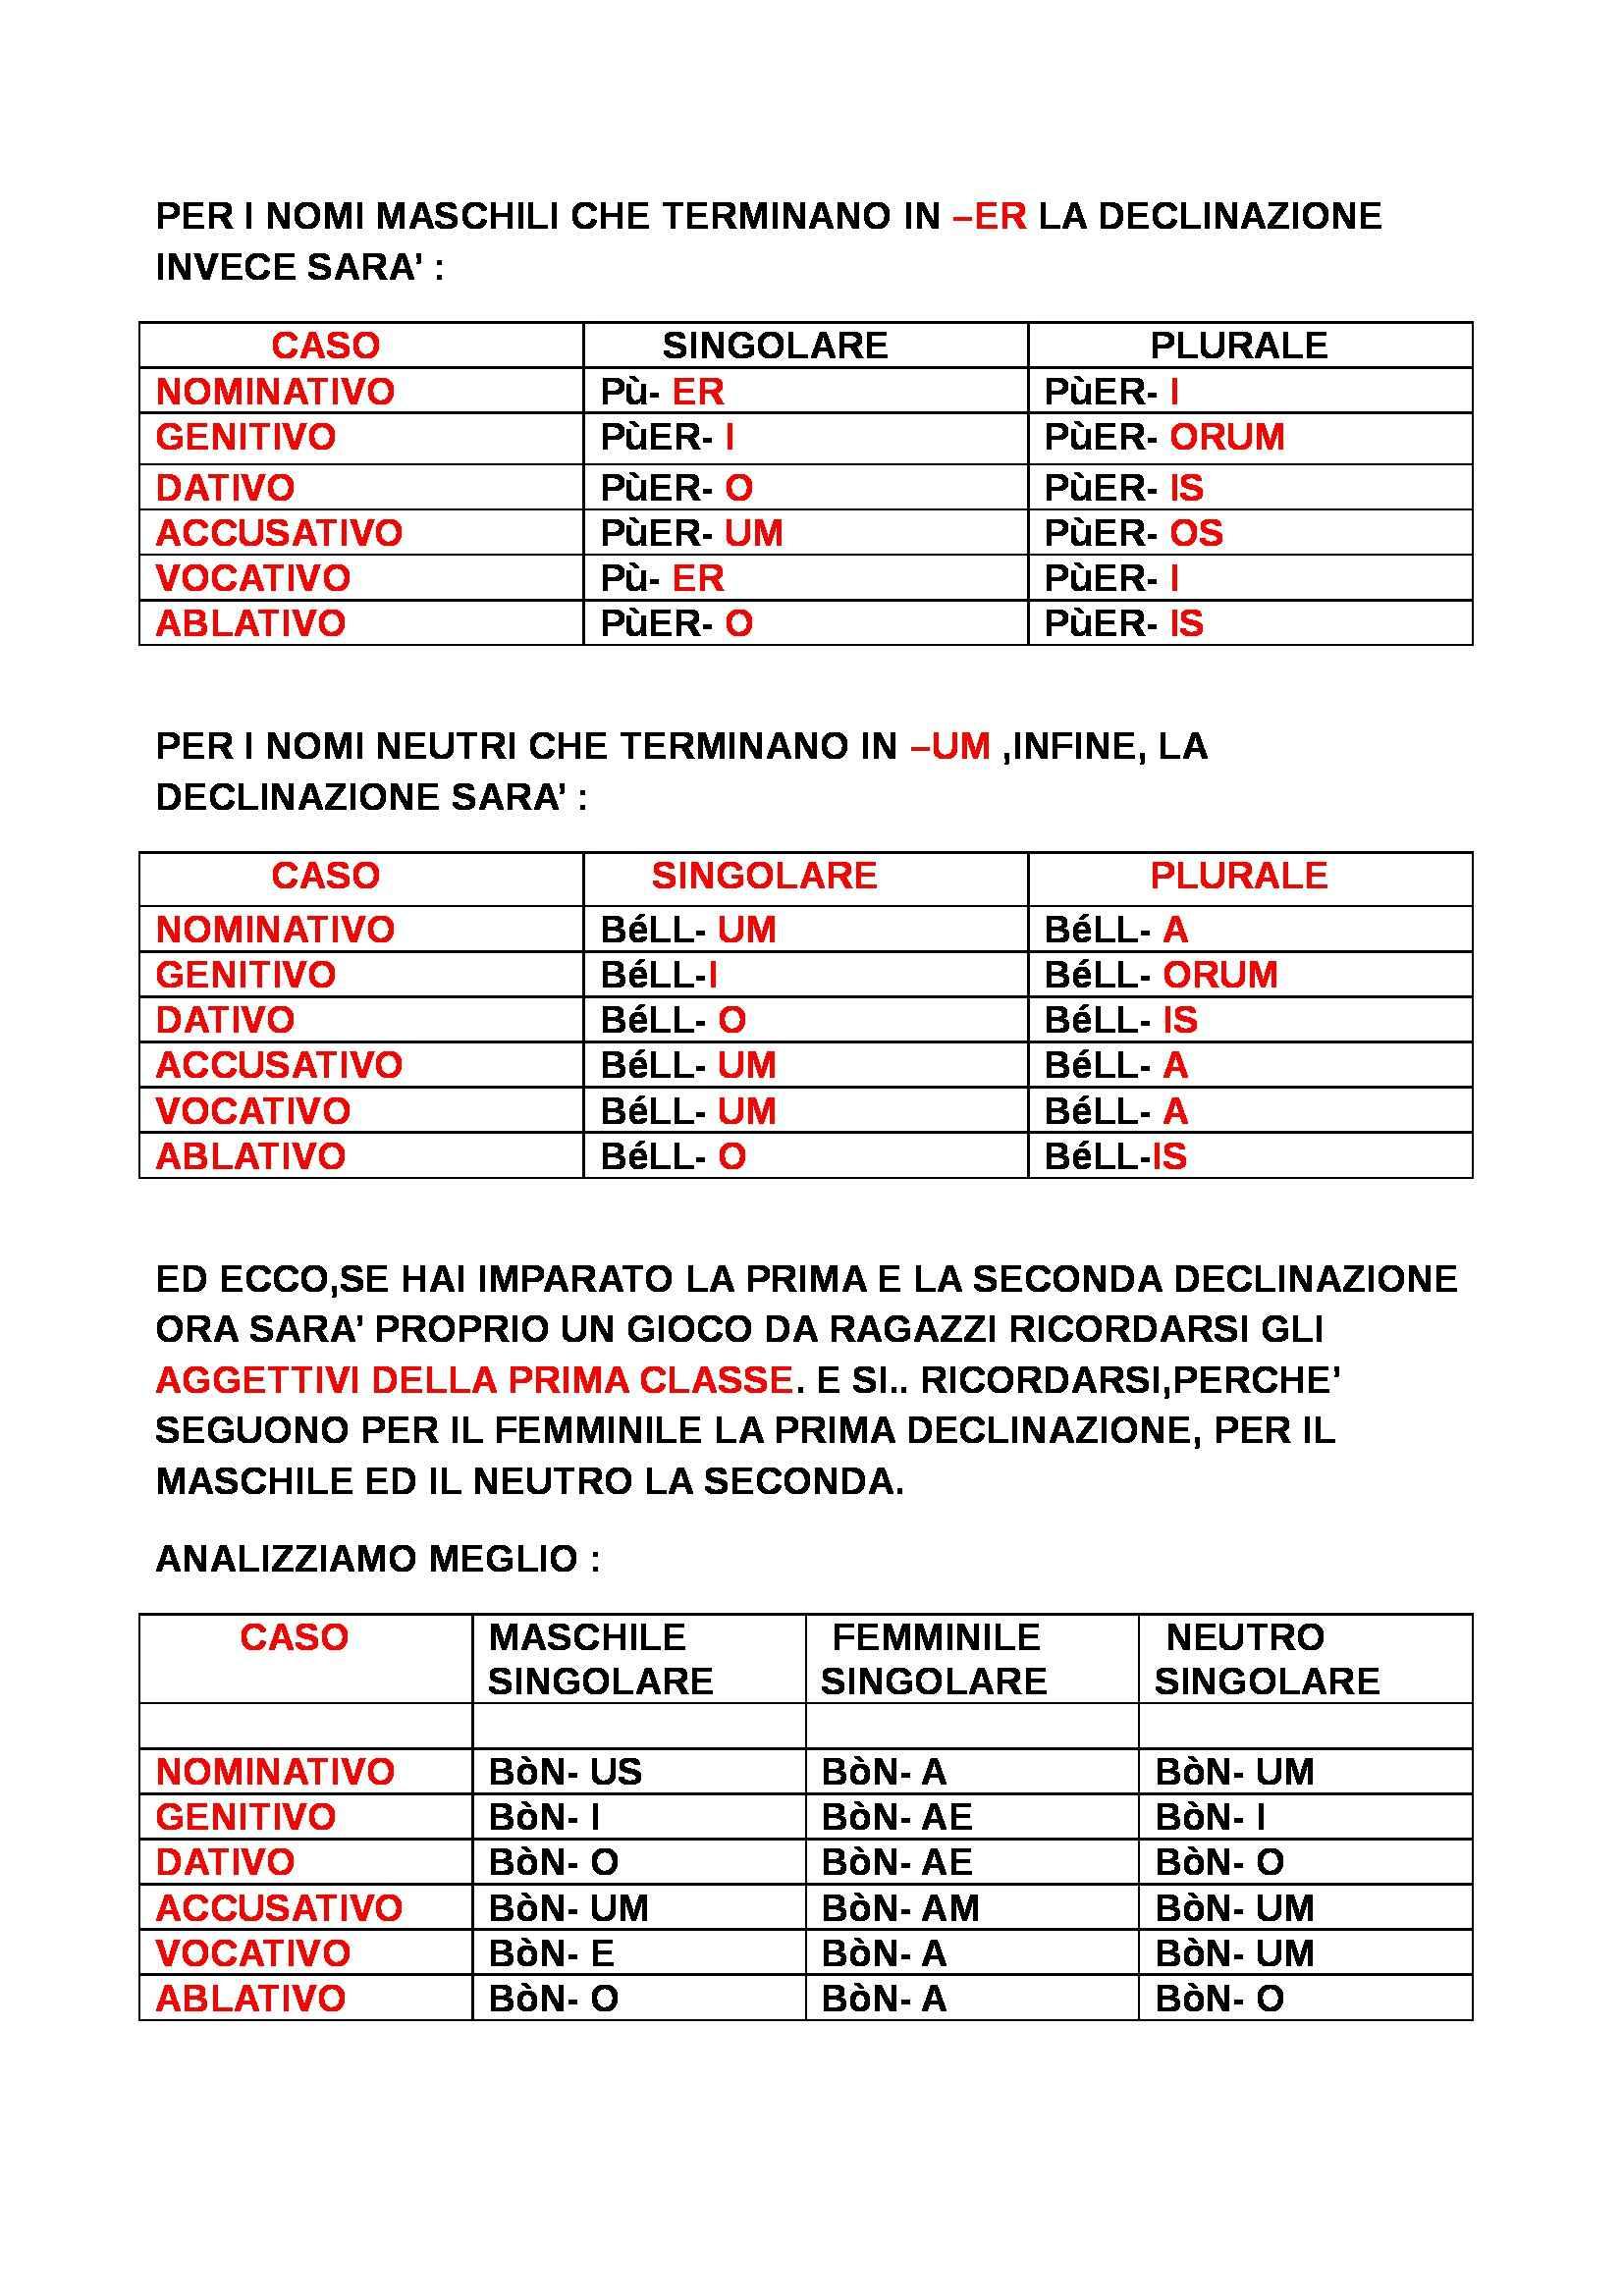 Lingua latina - Appunti Pag. 2